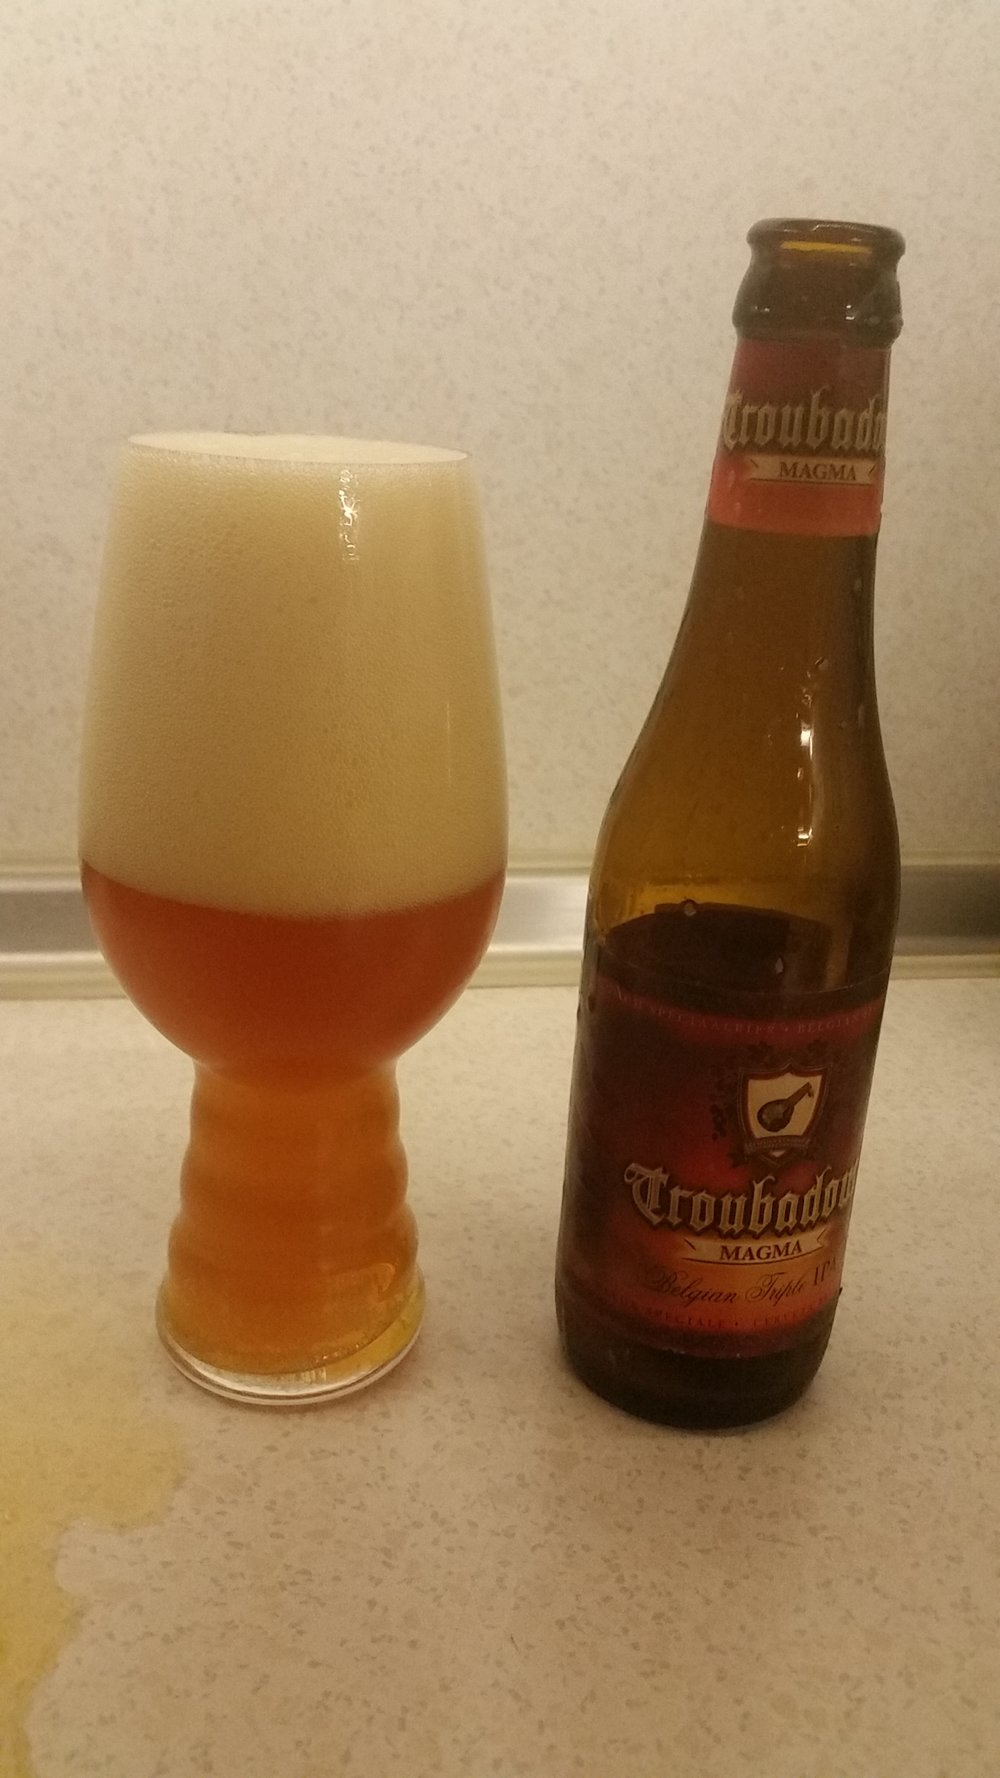 troubadour-magma-beer